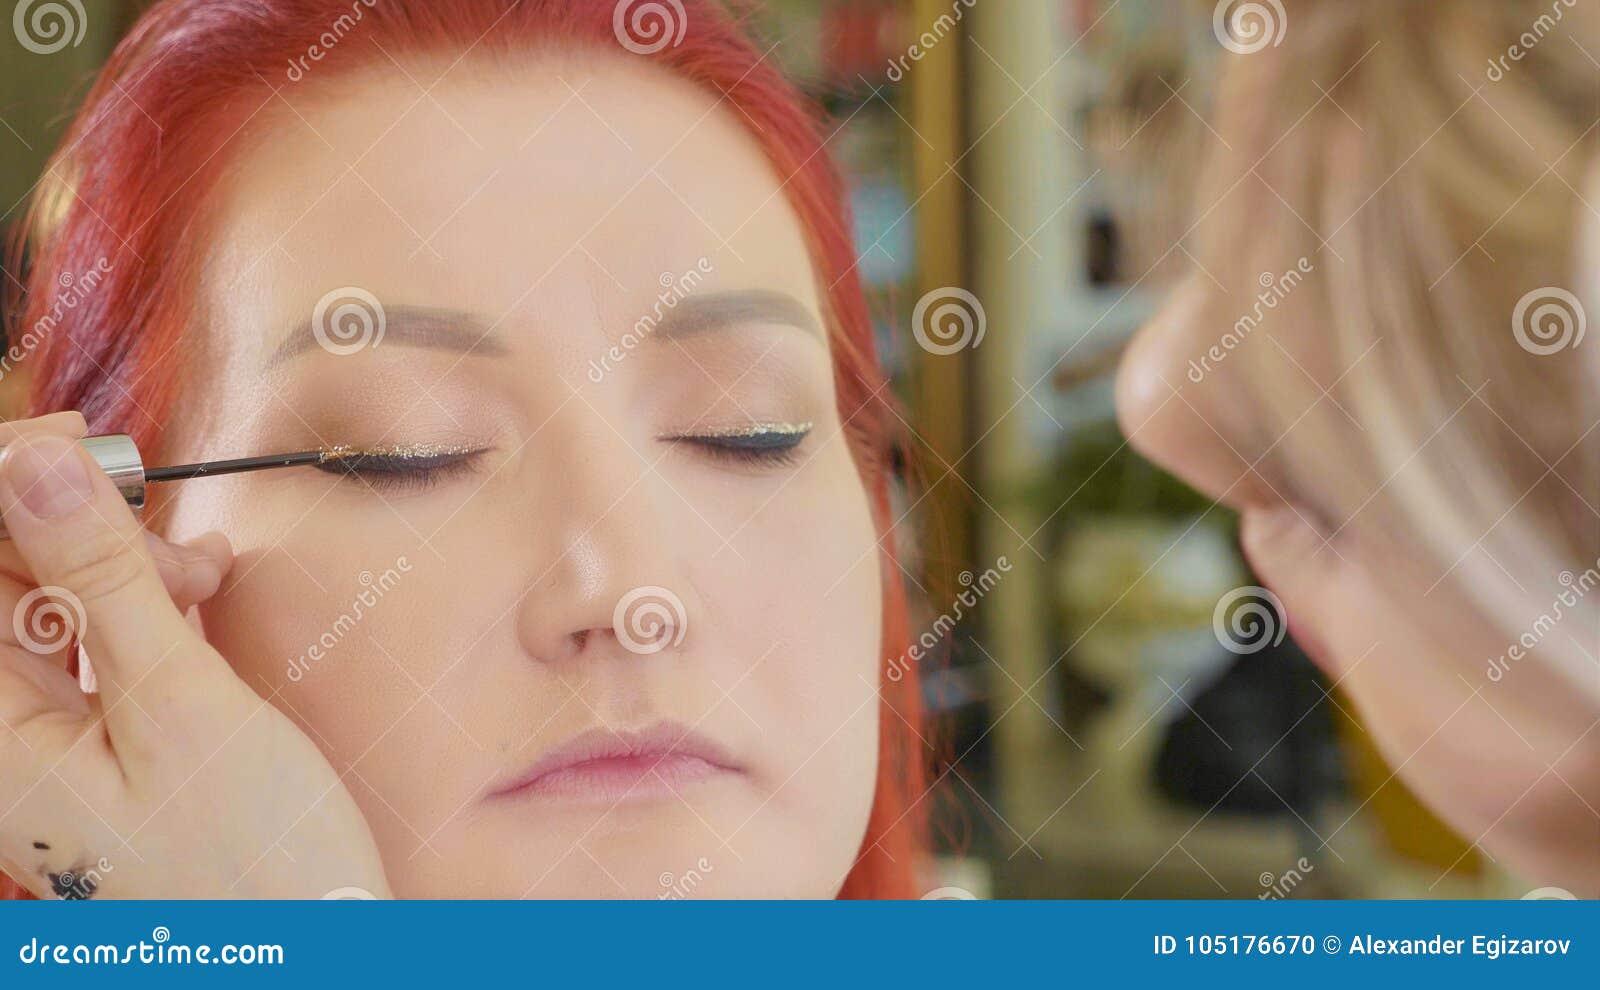 Grimeur die make-up toepassen om het oog van ` te modelleren s Sluit omhoog mening